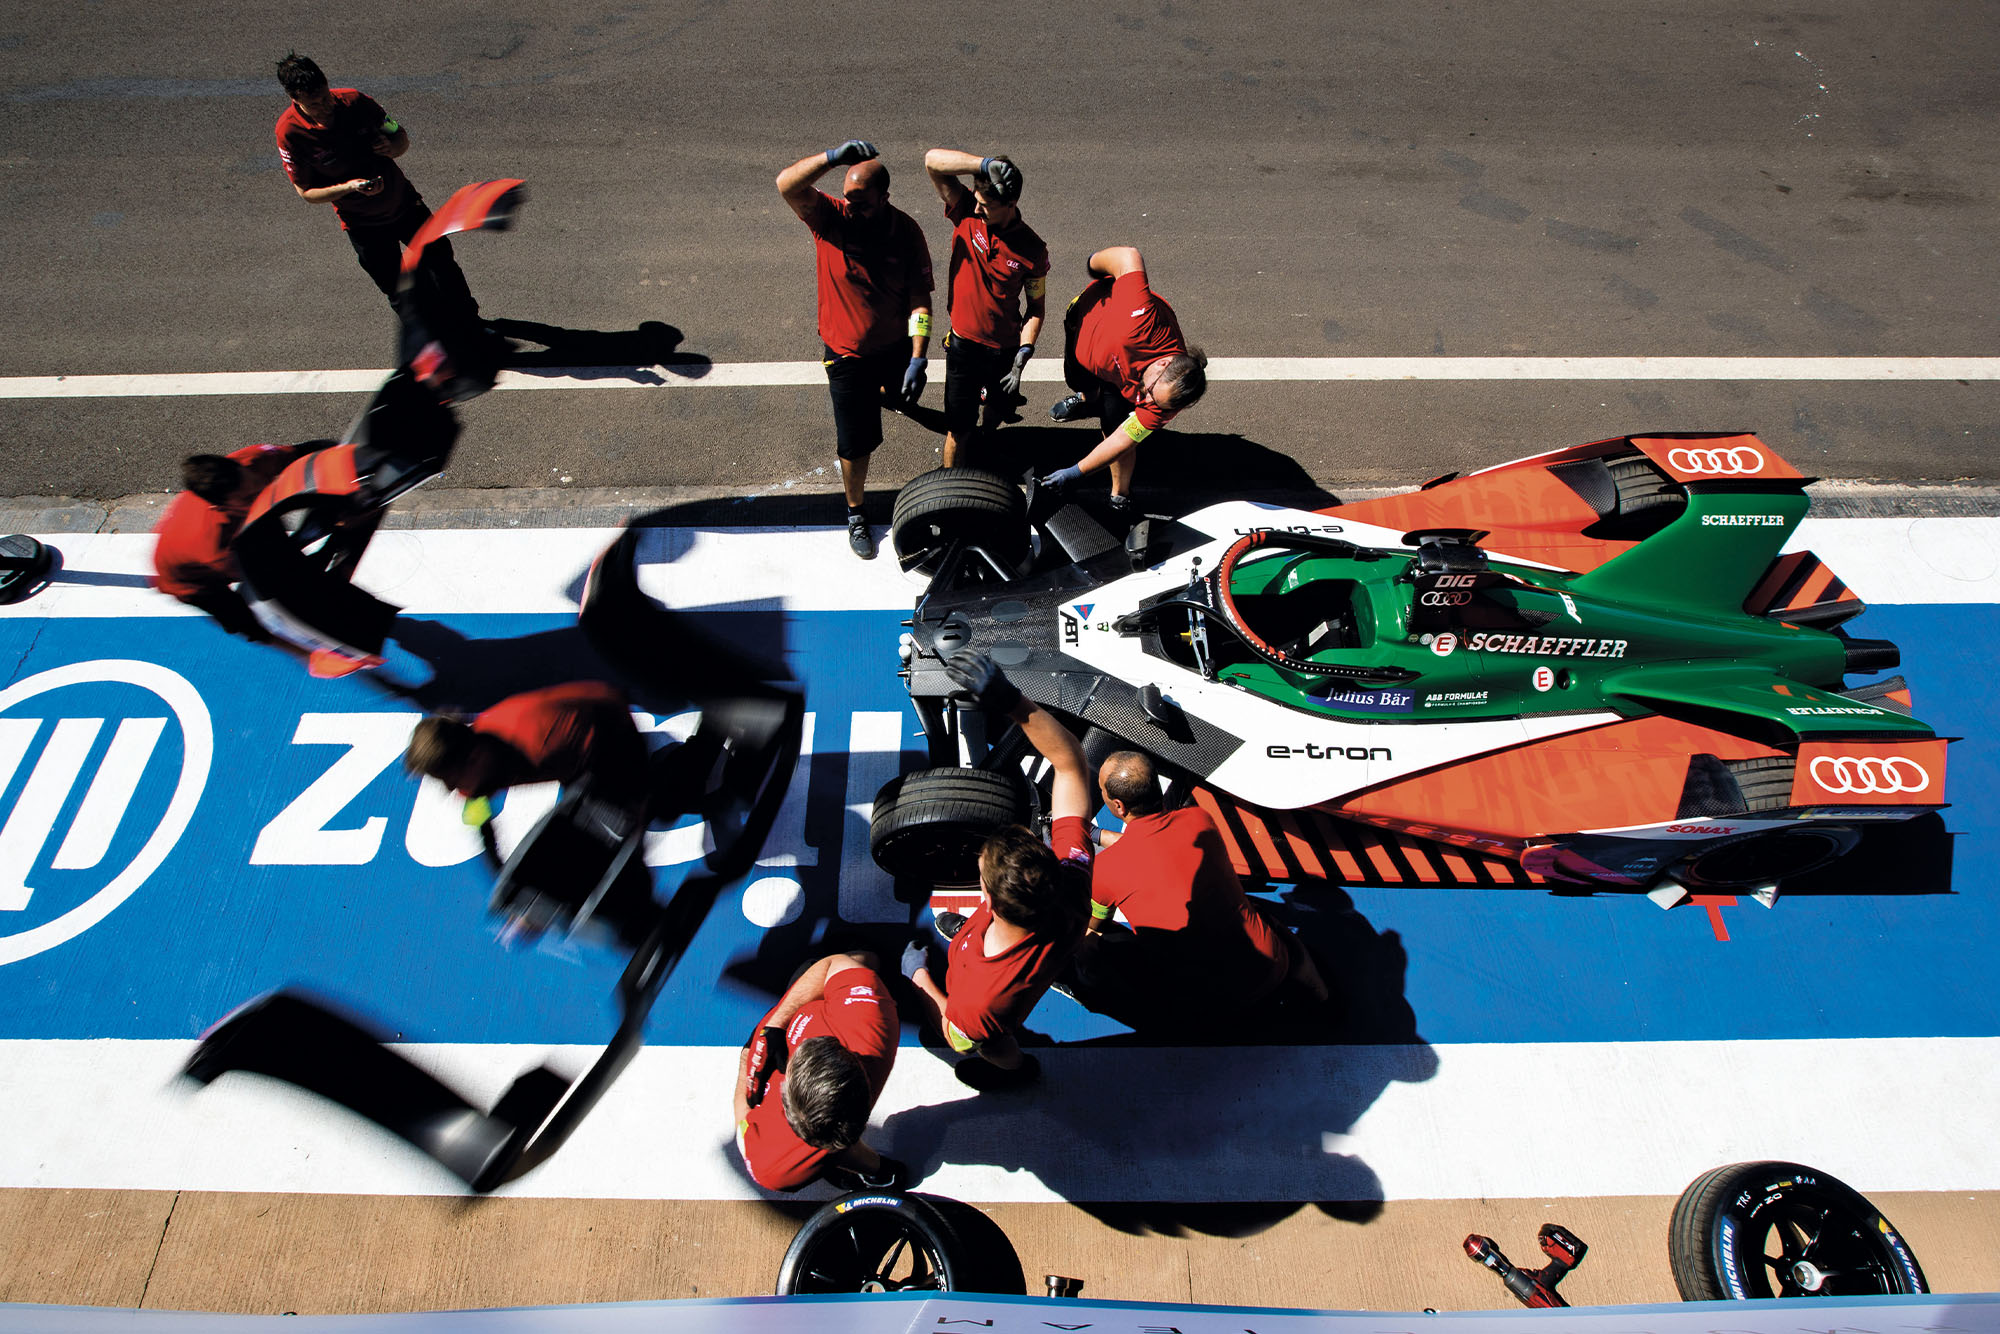 Audi Formula E team change the nose of the car